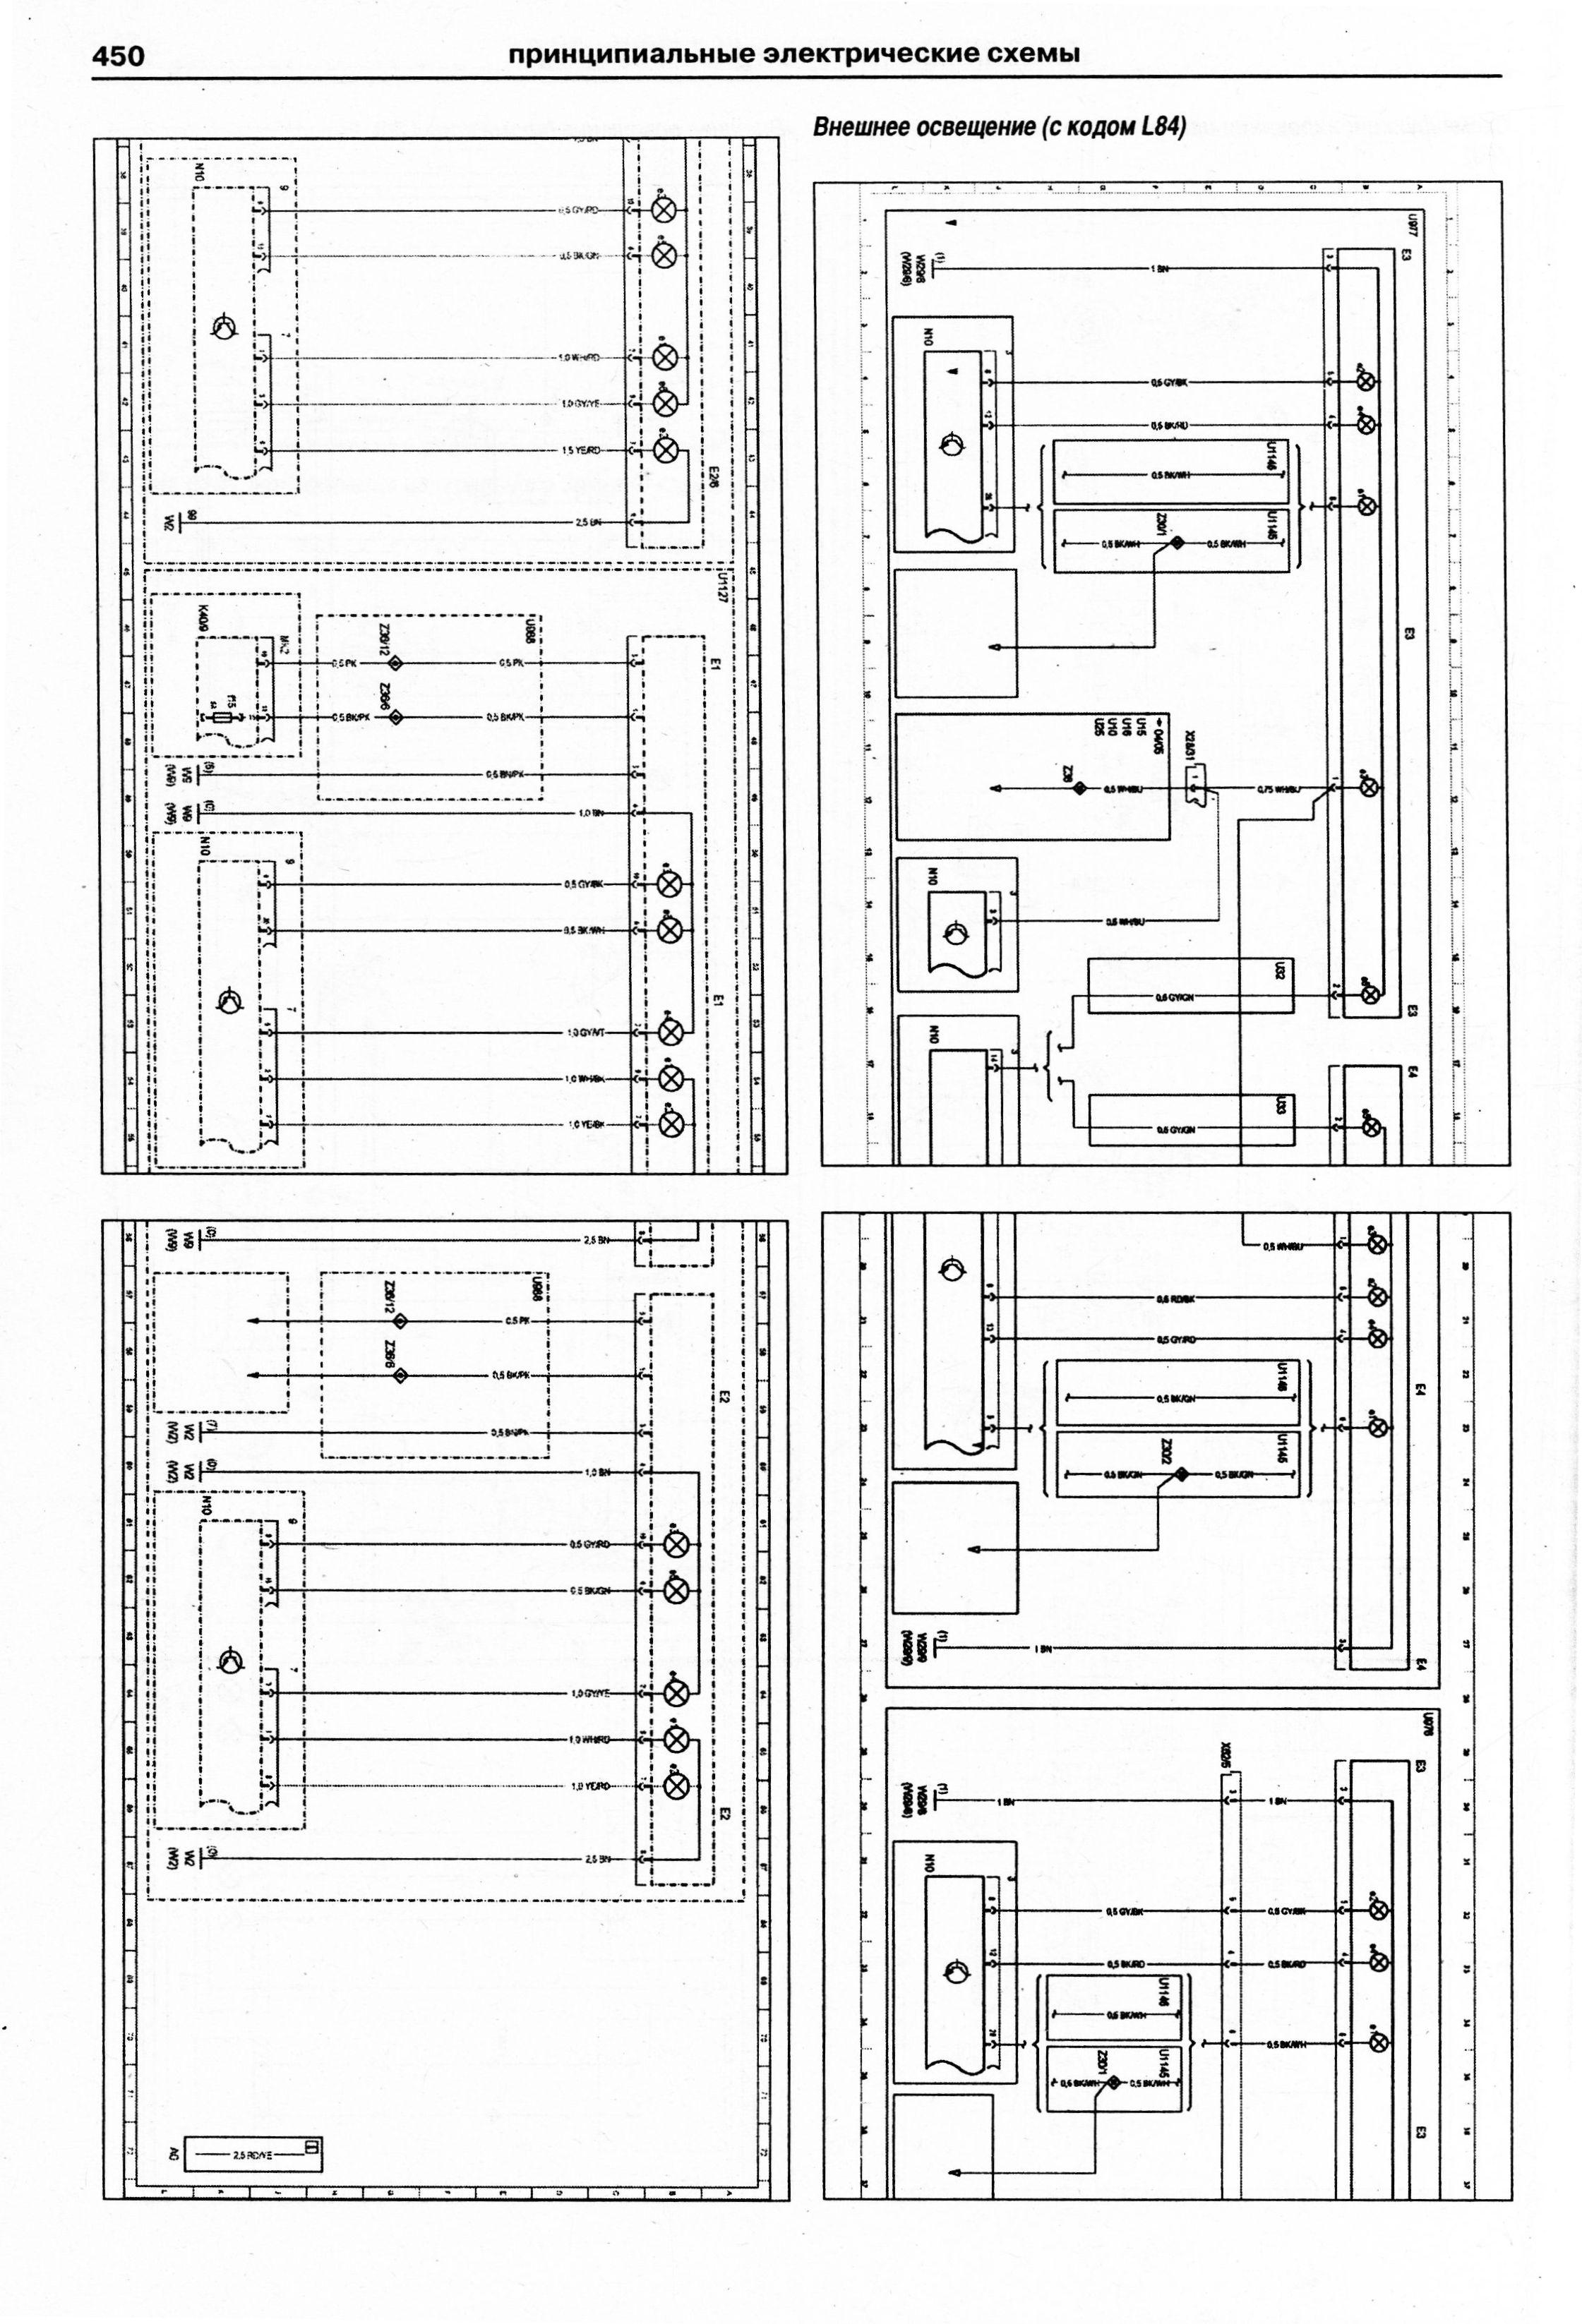 2003 Mercedes Benz Ml500 | Wiring Diagram Database